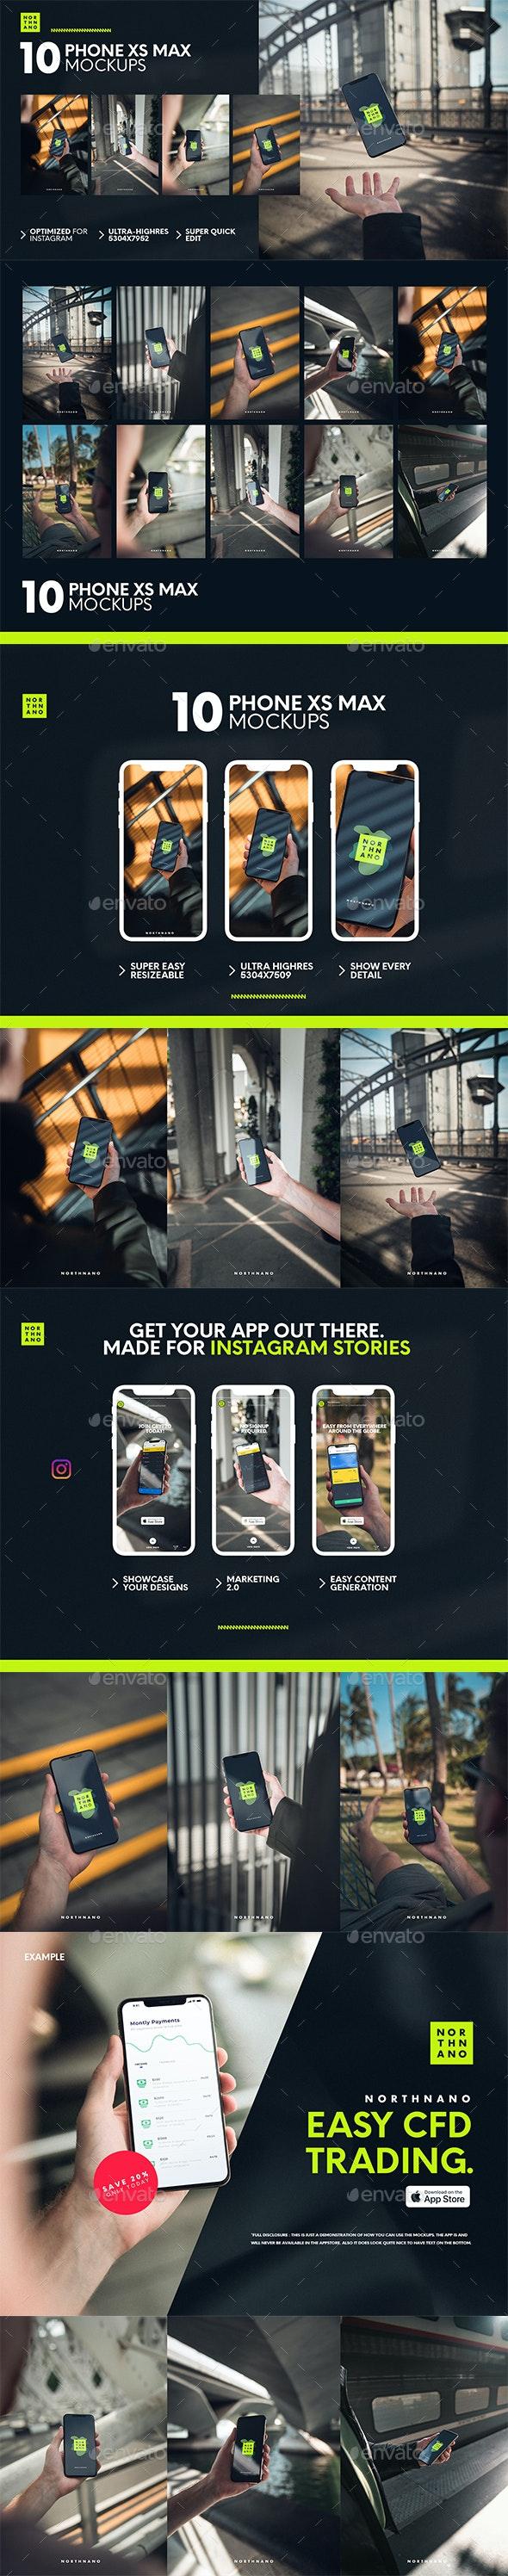 10 Phone XS MAX Mockups for Insta - Mobile Displays